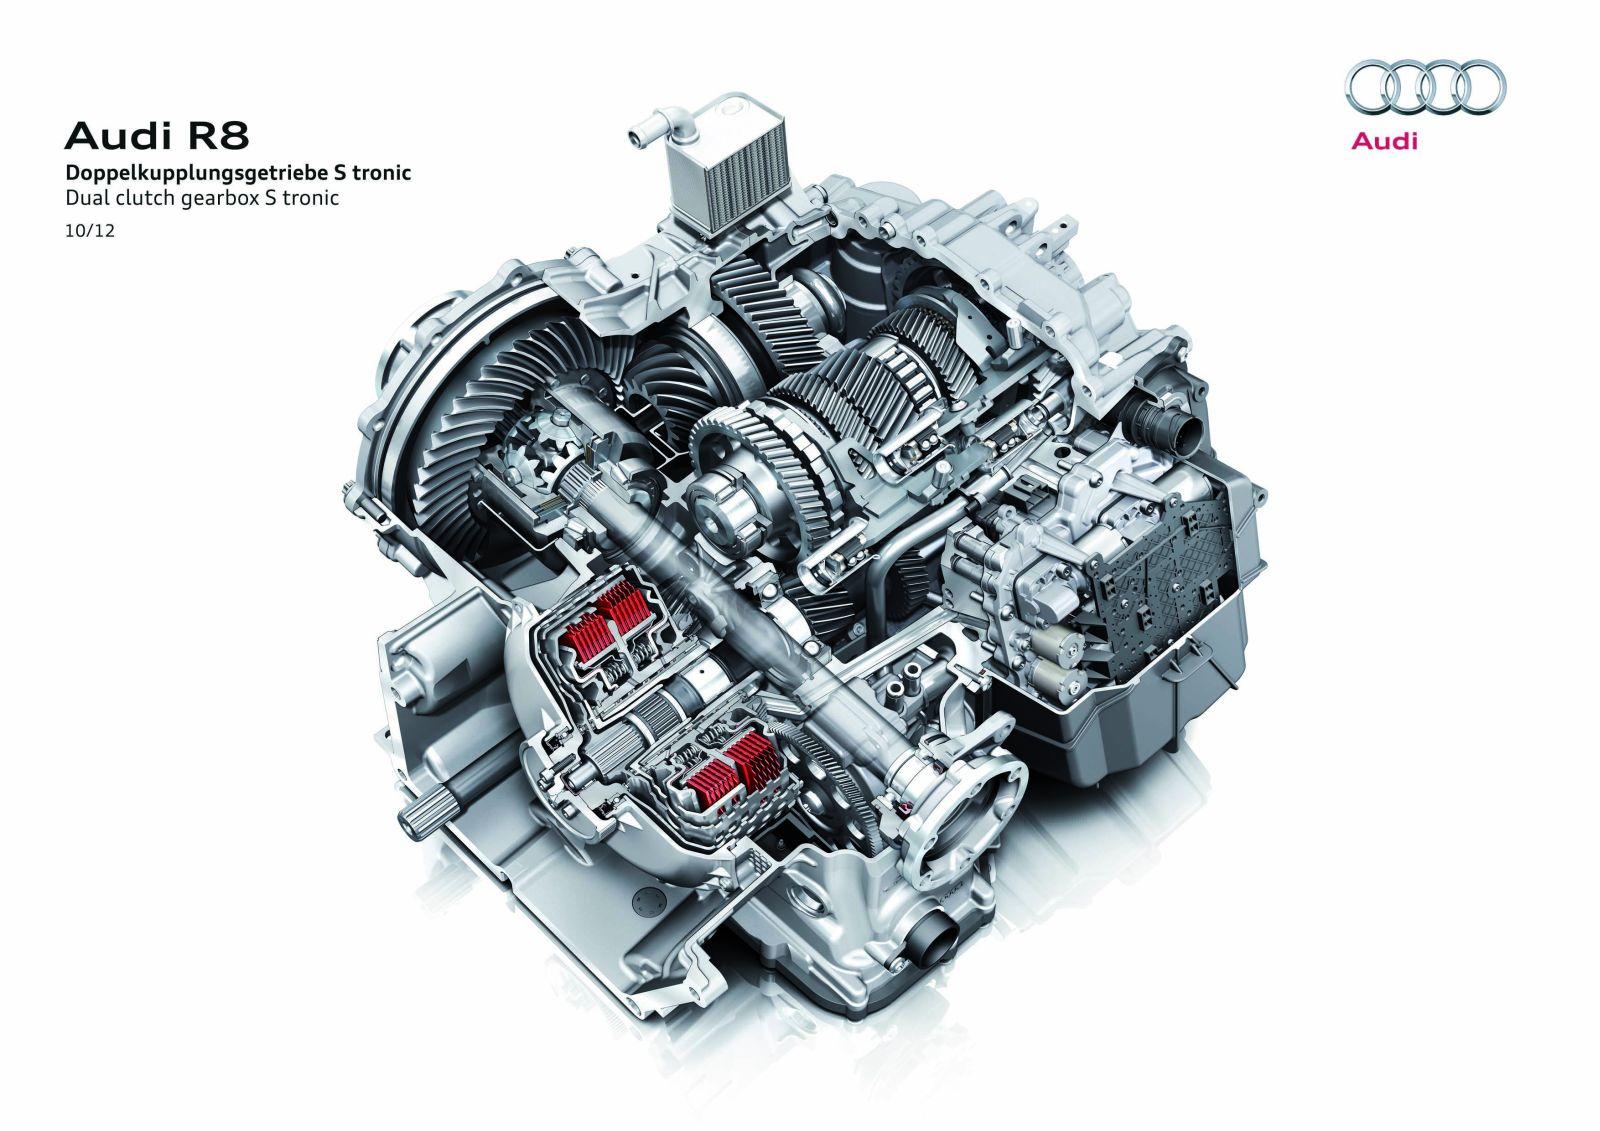 Audi4Ever - a4e Blog - Detail - Presse - Der neue Audi R8 ...